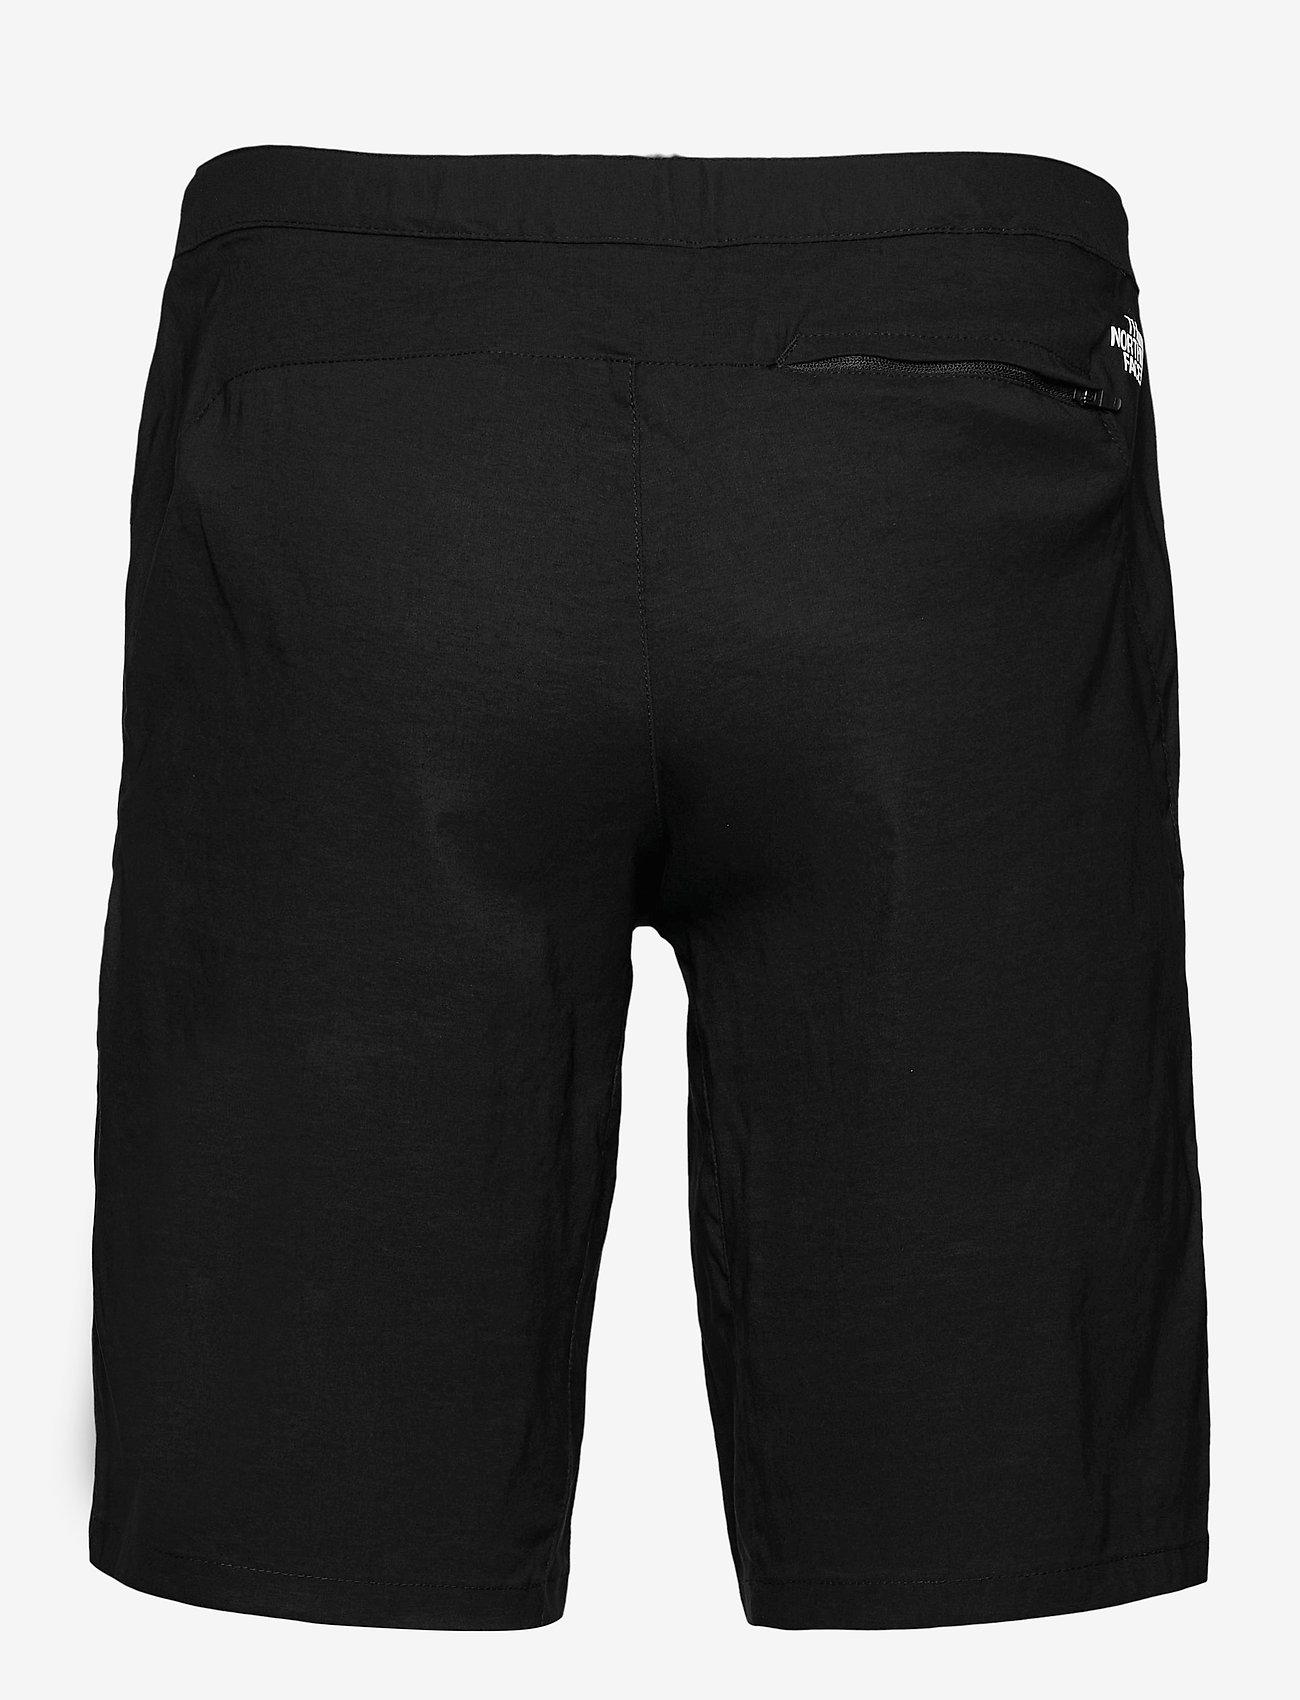 The North Face - M LIGHTNING SHT - tights & shorts - tnf black - 1